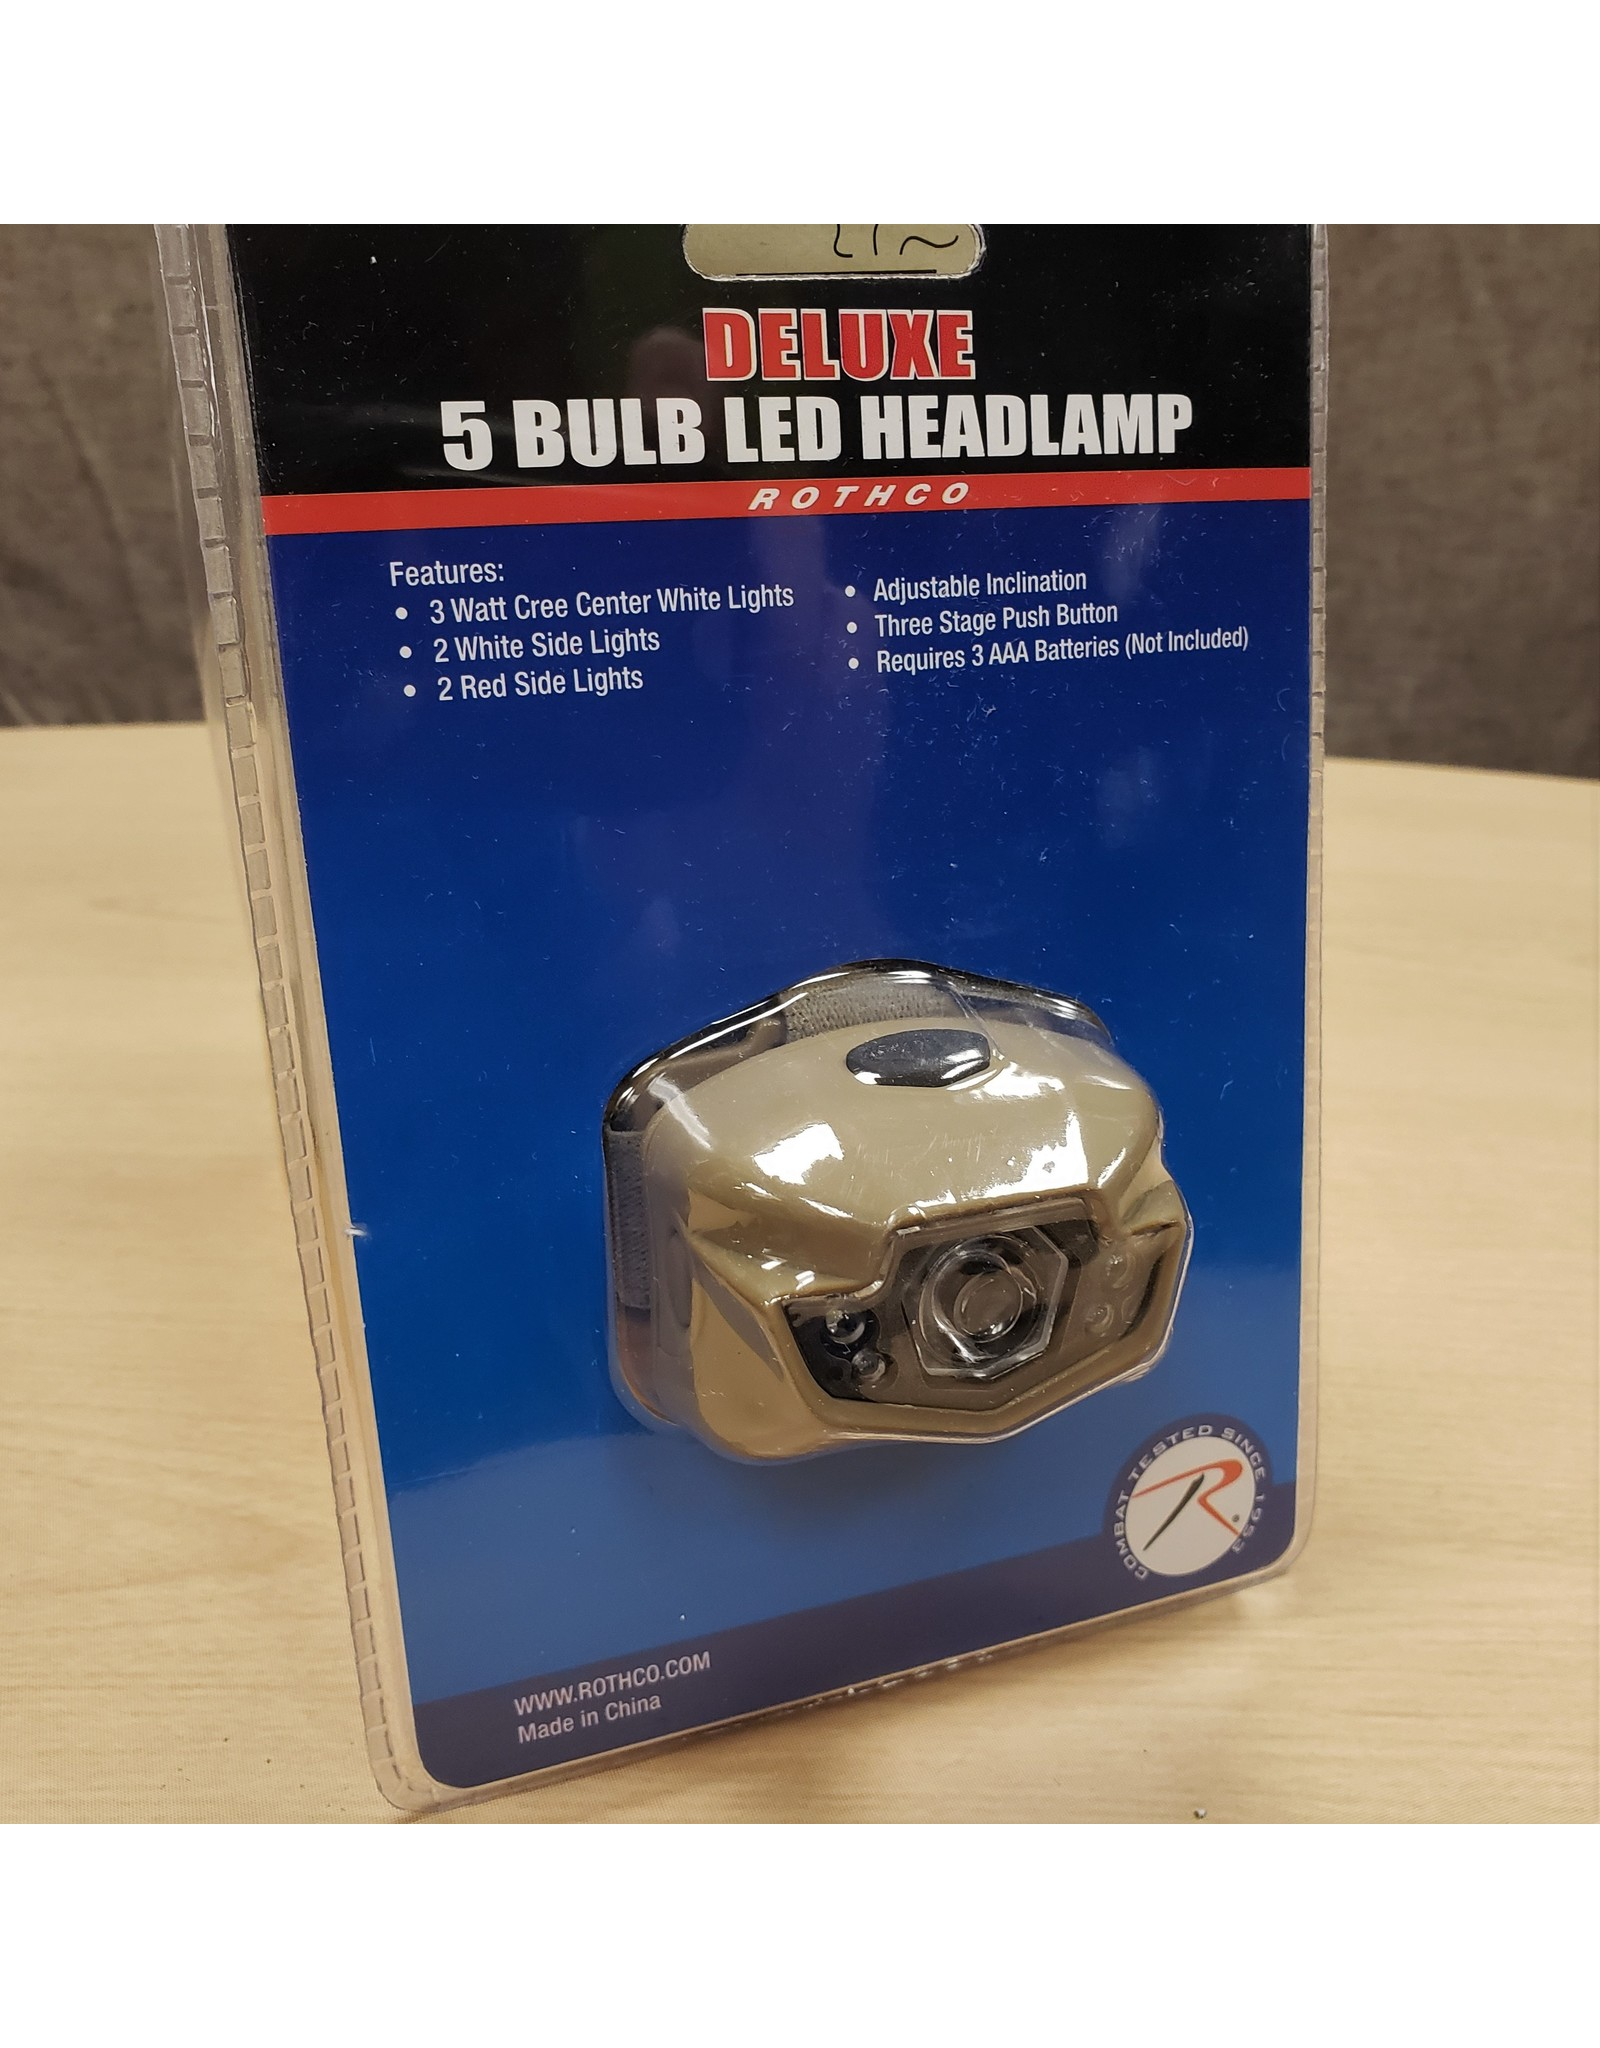 ROTHCO 5 BULB LED HEADLAMP